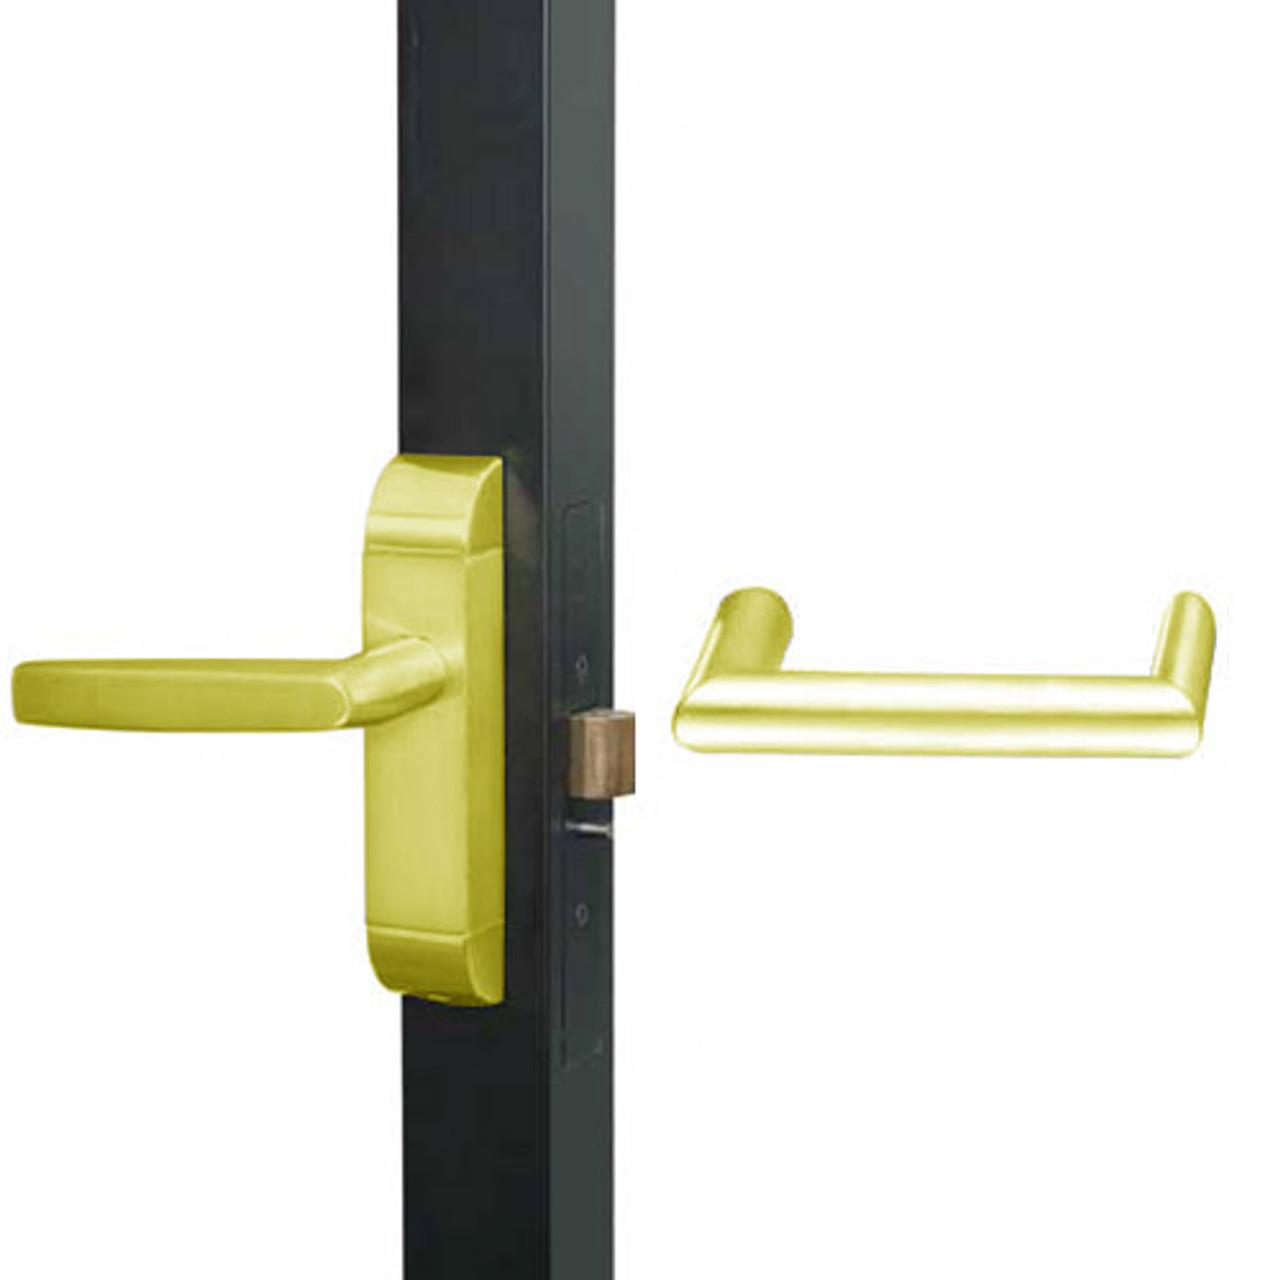 4600M-MW-551-US3 Adams Rite MW Designer Deadlatch handle in Bright Brass Finish